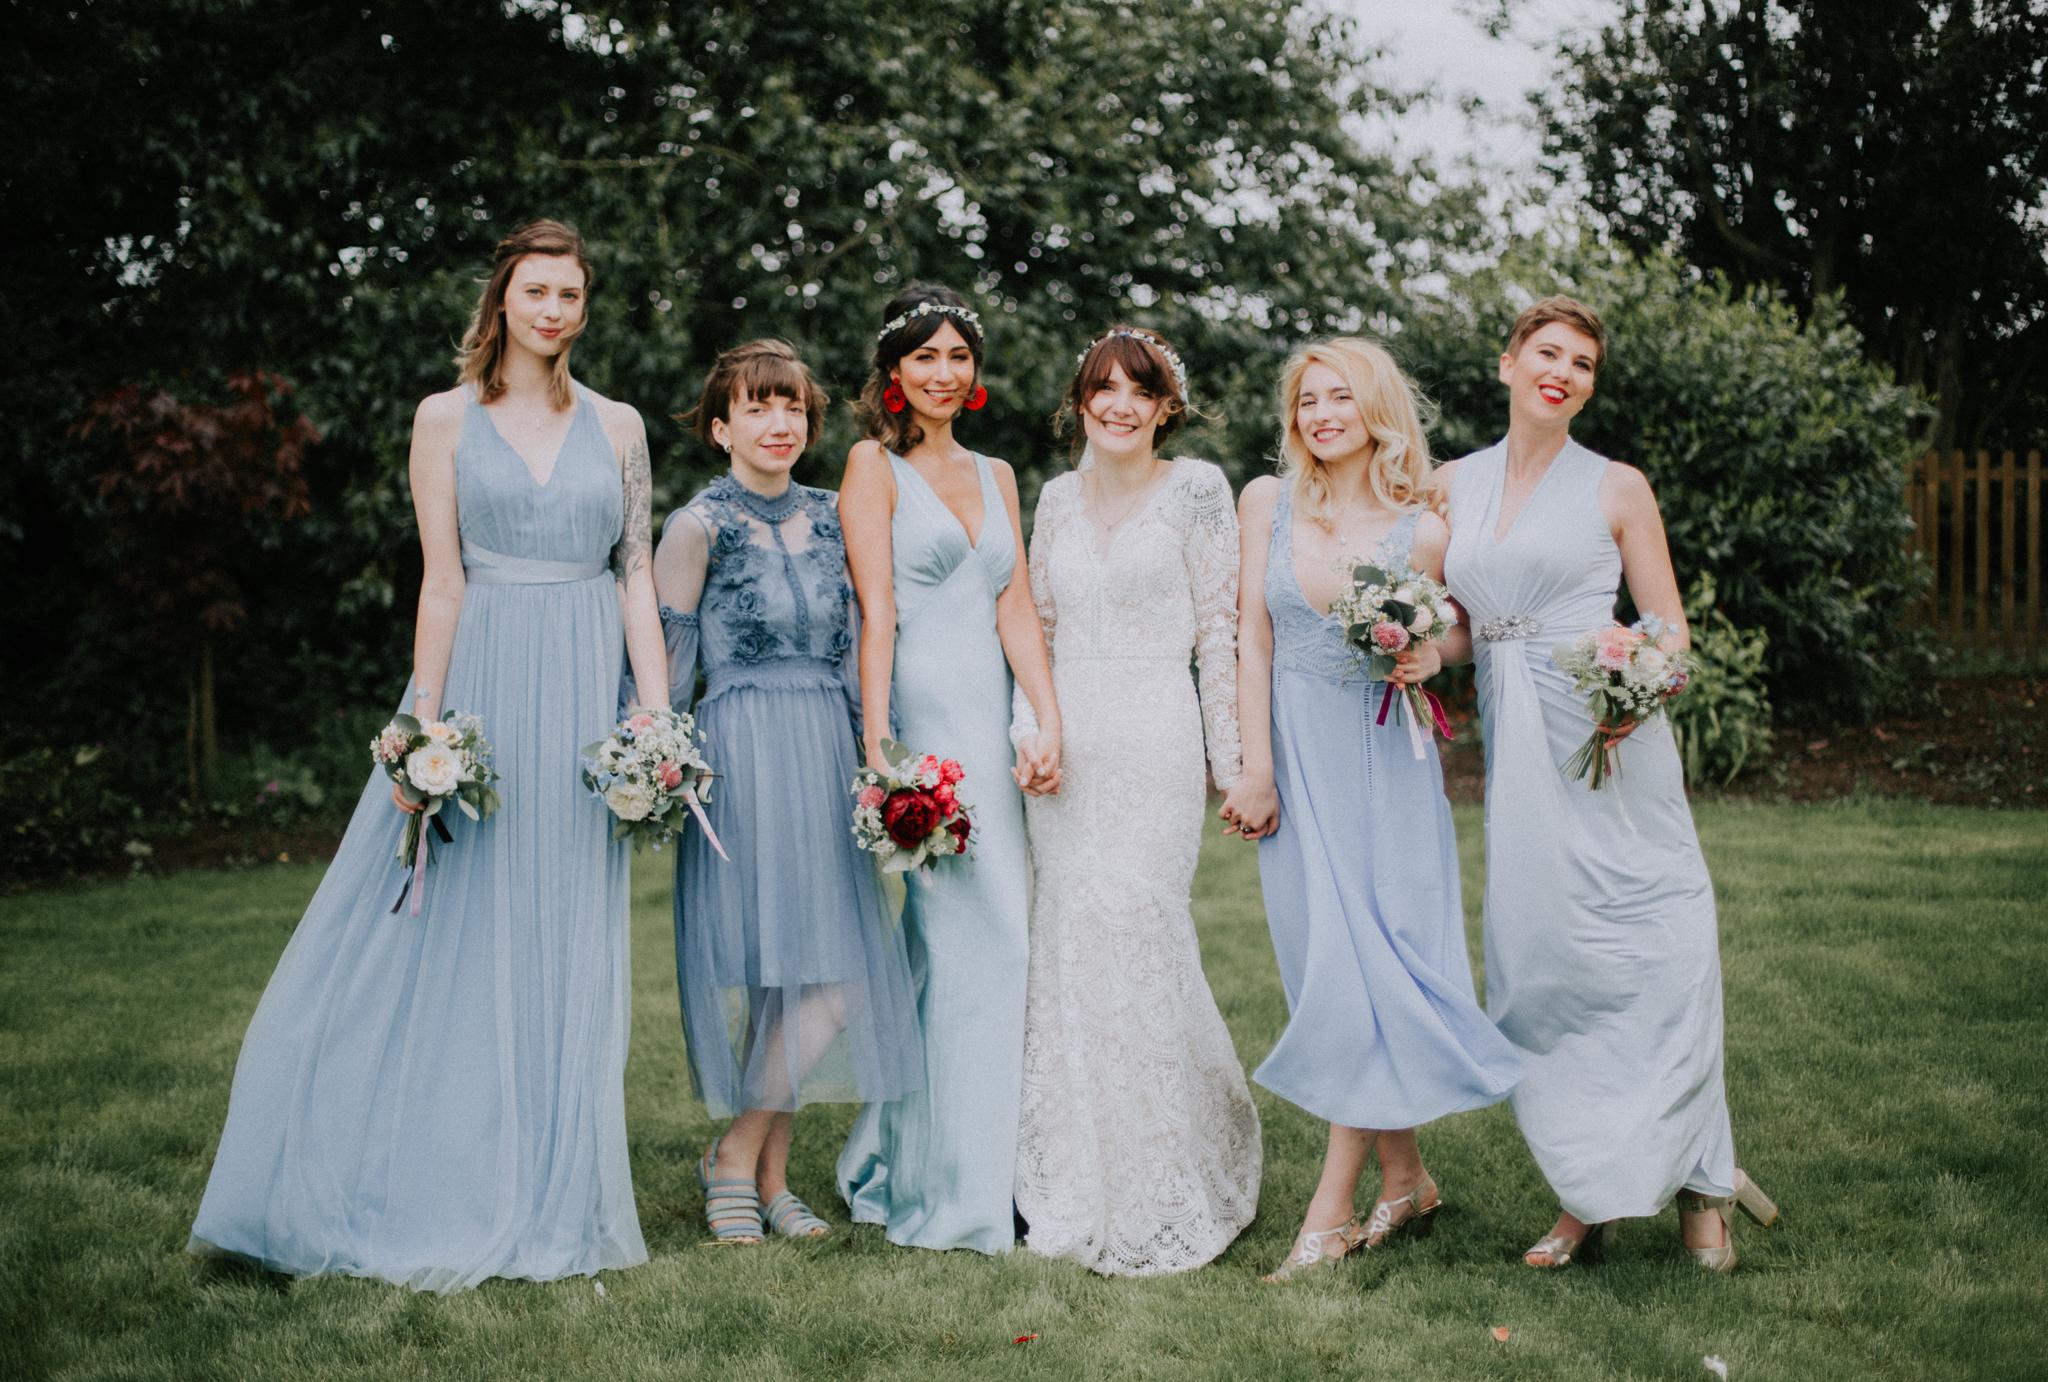 The bohemian bridal party